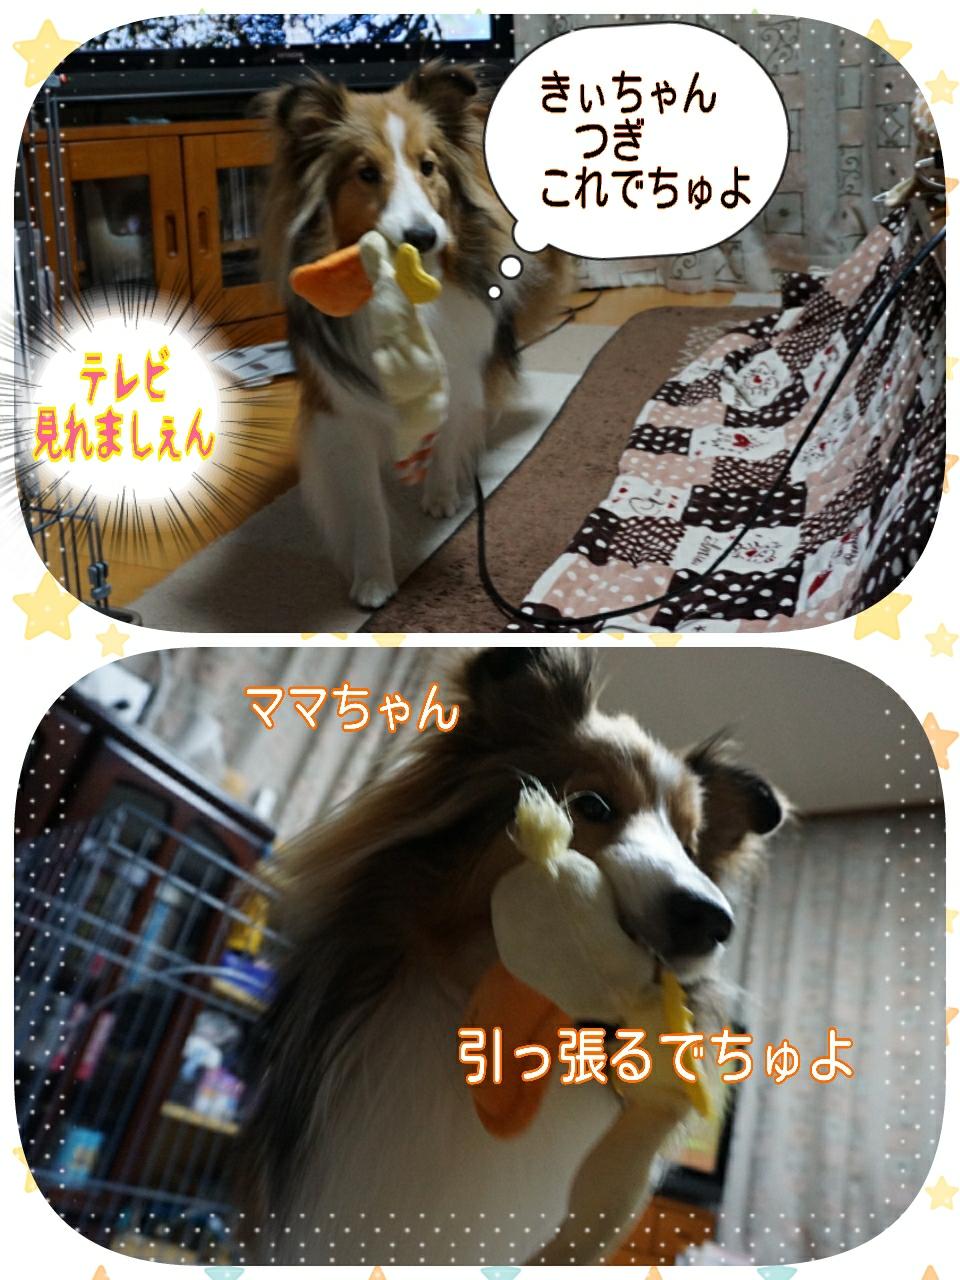 2015-03-11-07-25-40_deco.jpg